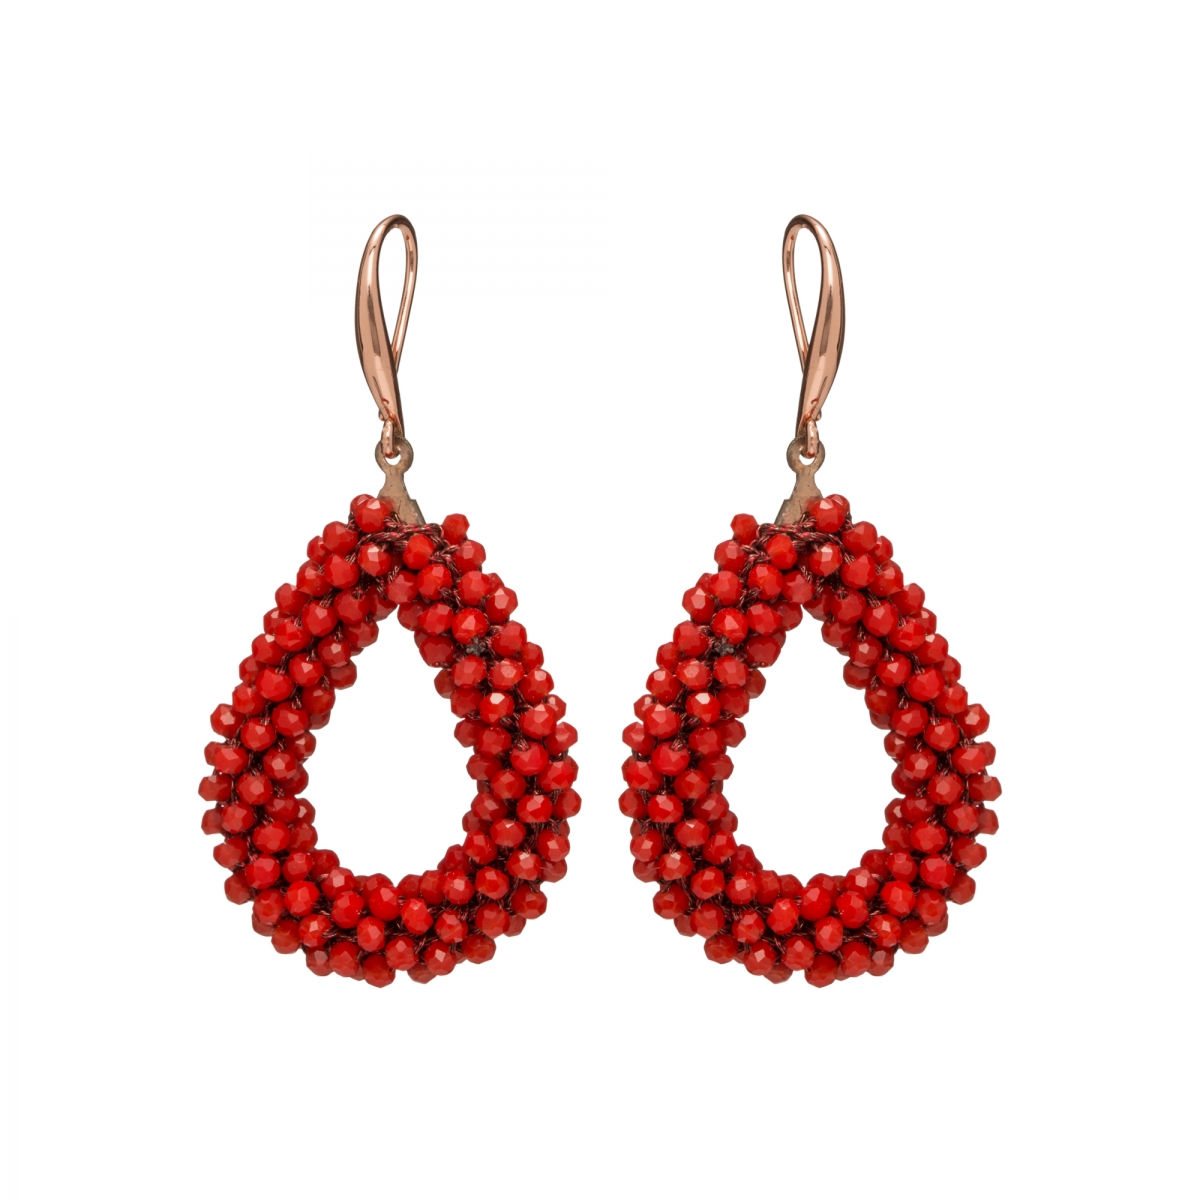 Náušnice Dila Red Rose Gold Crystal Beads